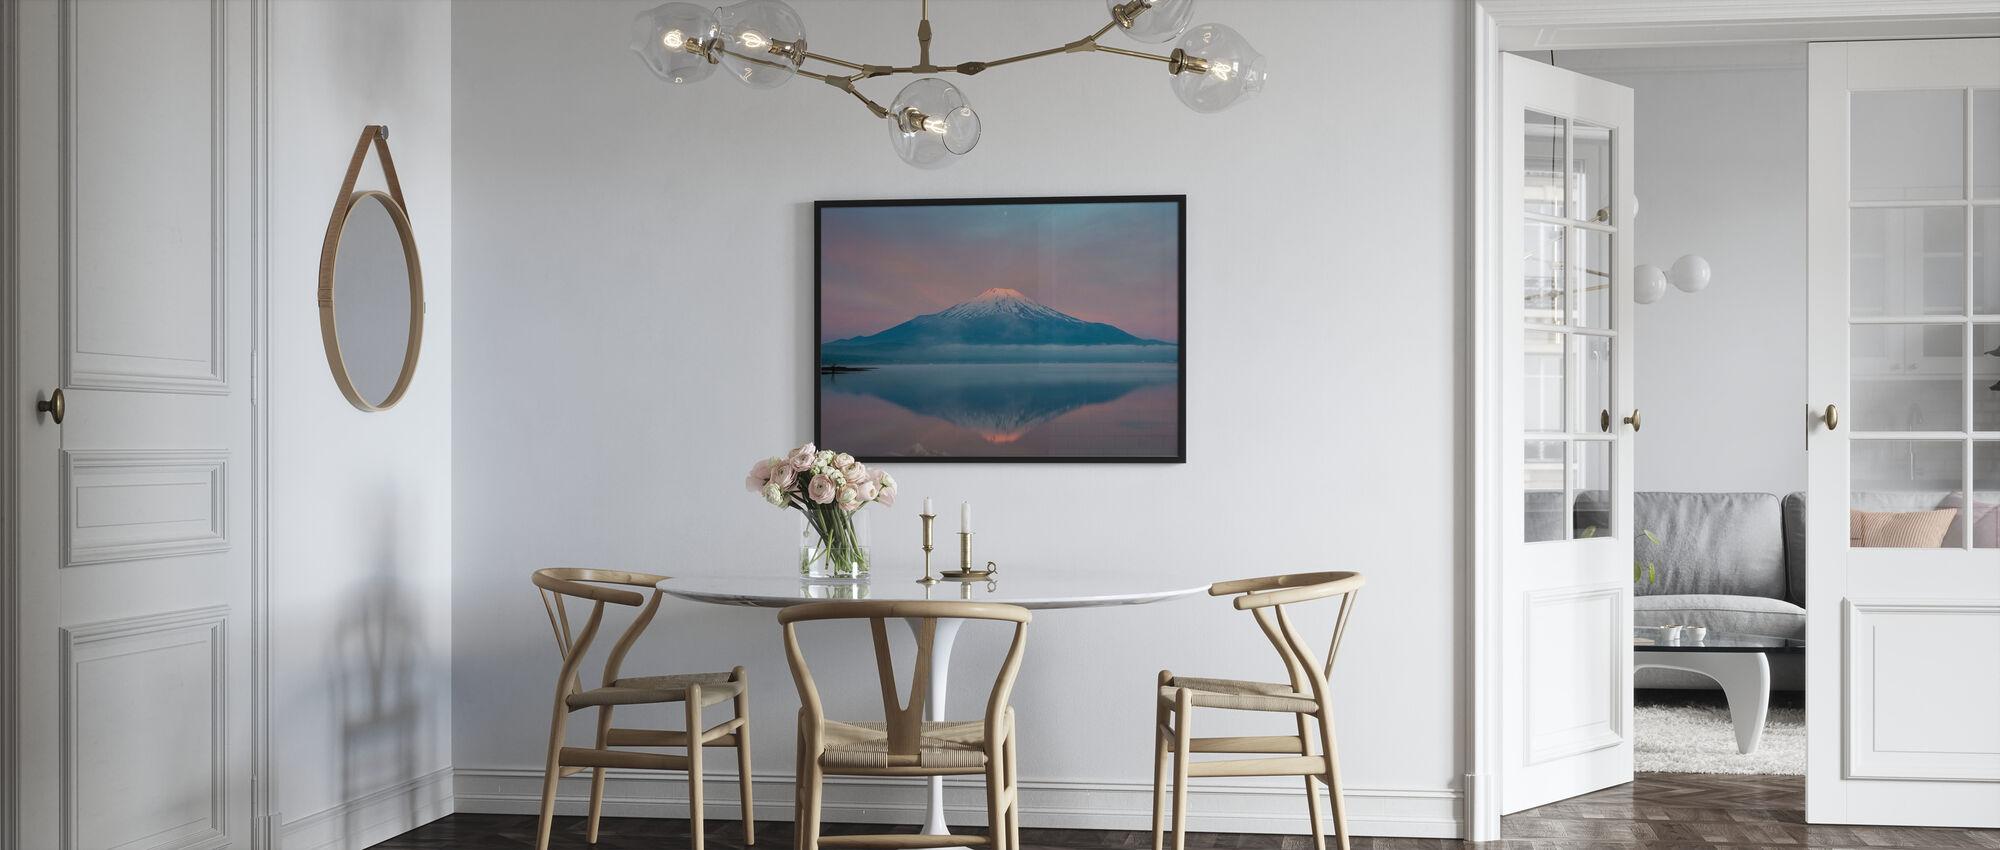 Kleur van zonsopgang - Ingelijste print - Keuken